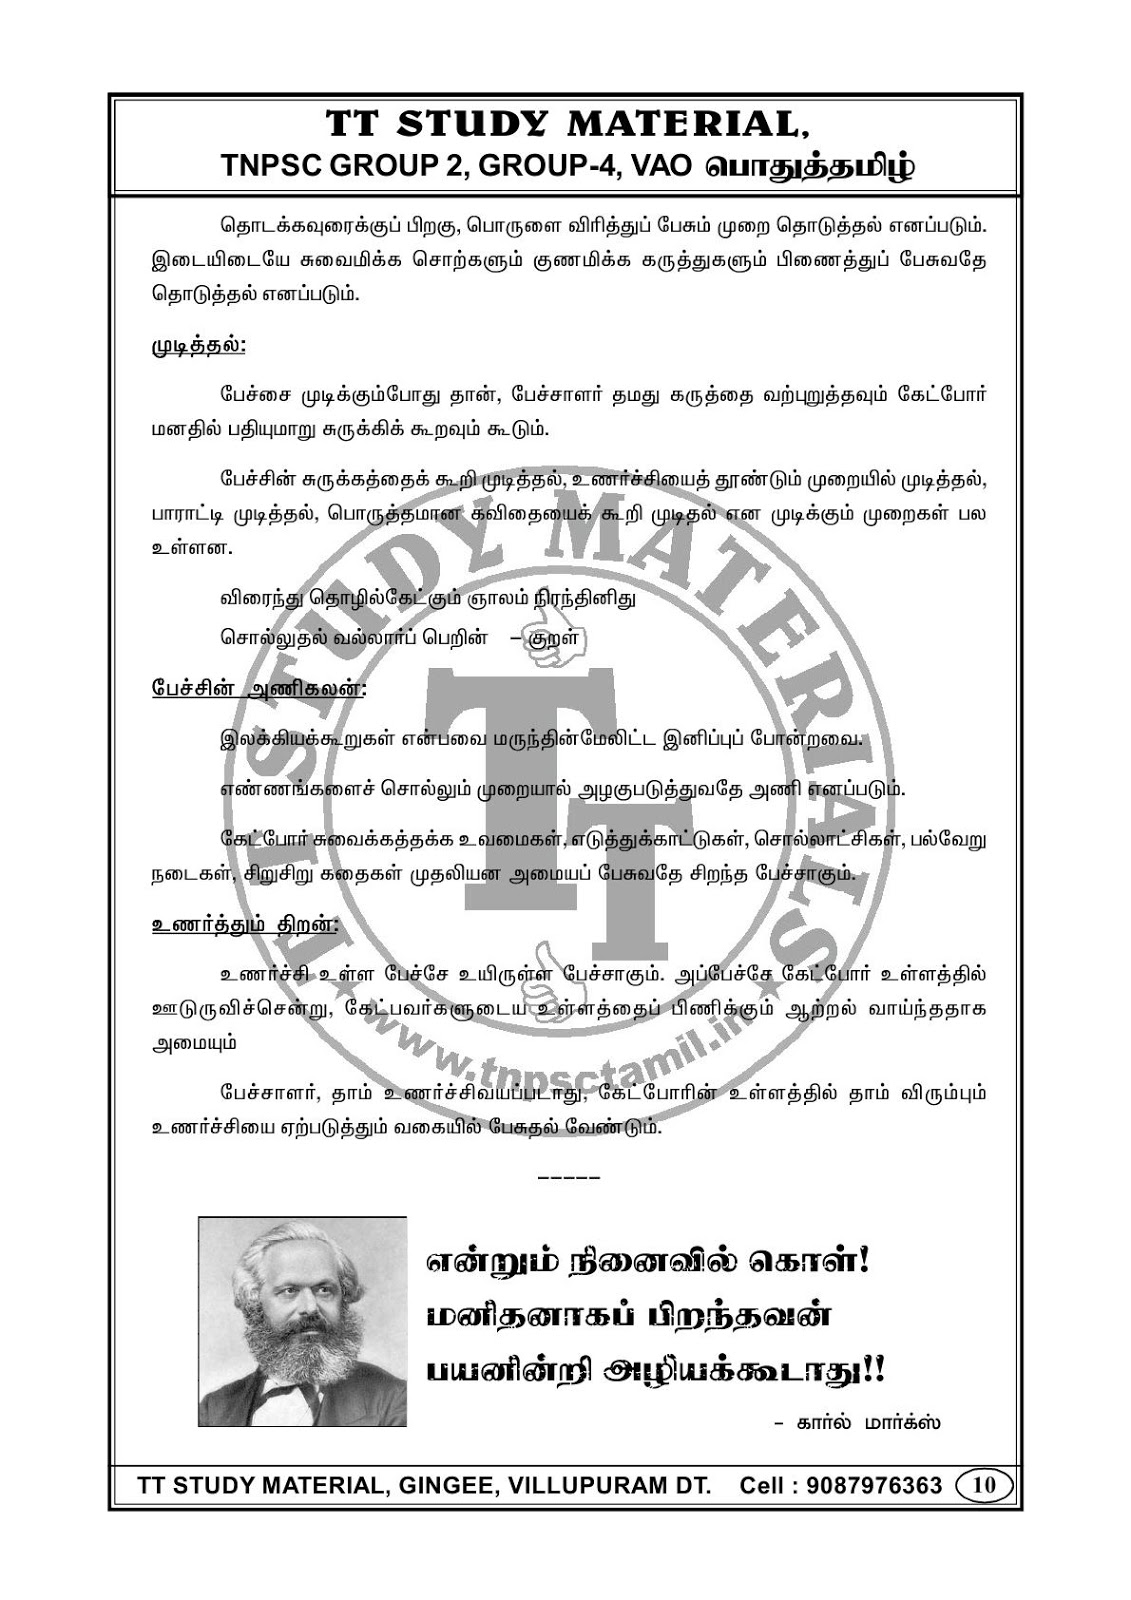 tnpsc group 2 study material pdf free download